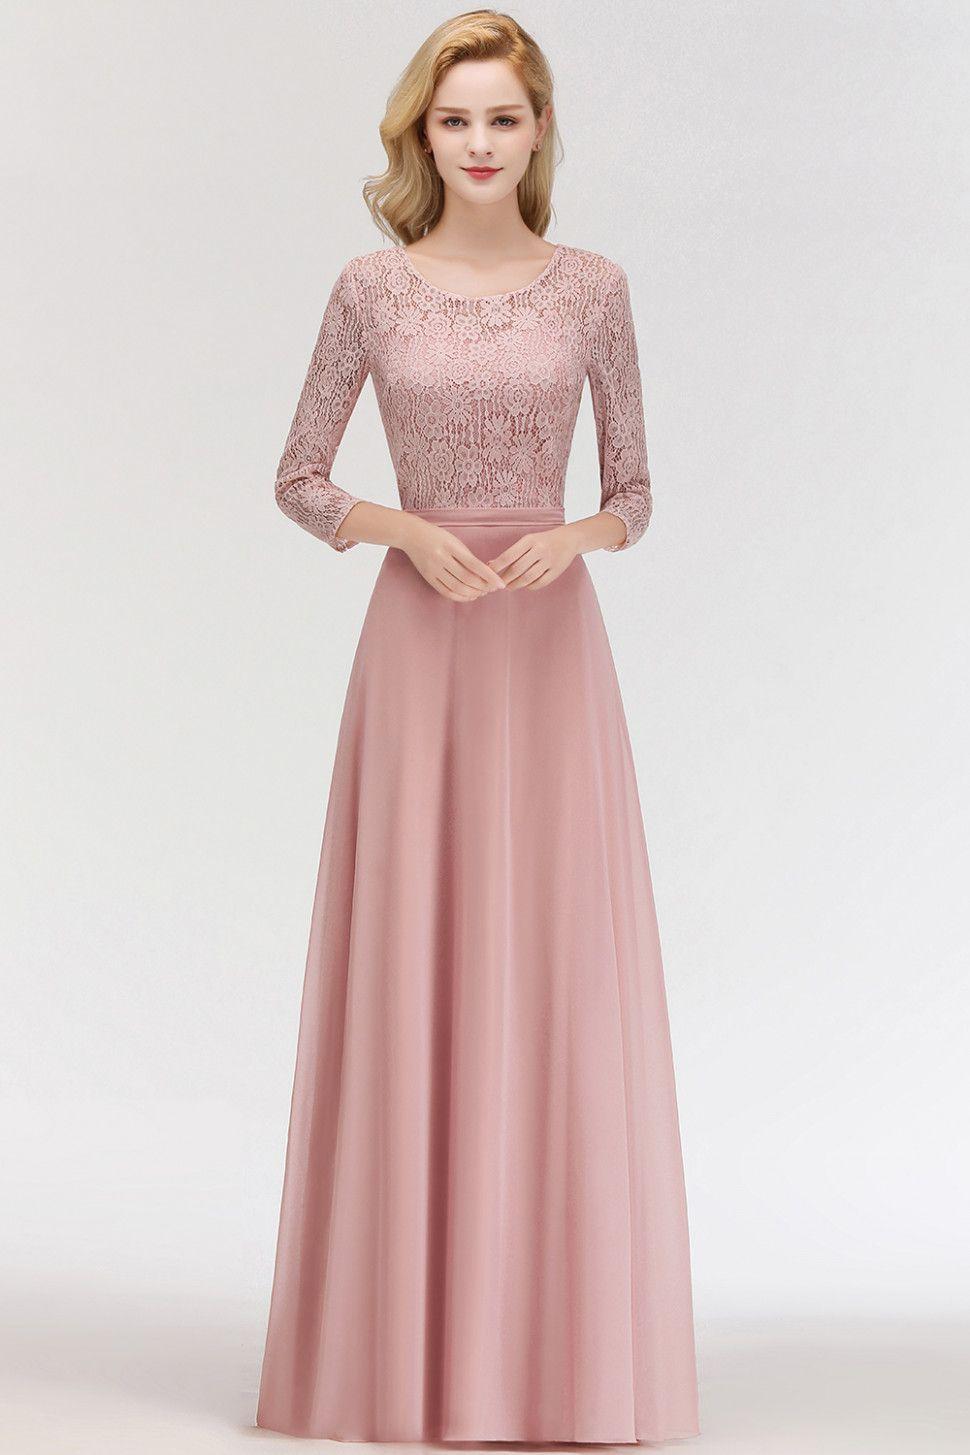 10 Kleid Altrosa In 2020 Brautjungfernkleid Kleid Spitze Schnittmuster Abendkleid